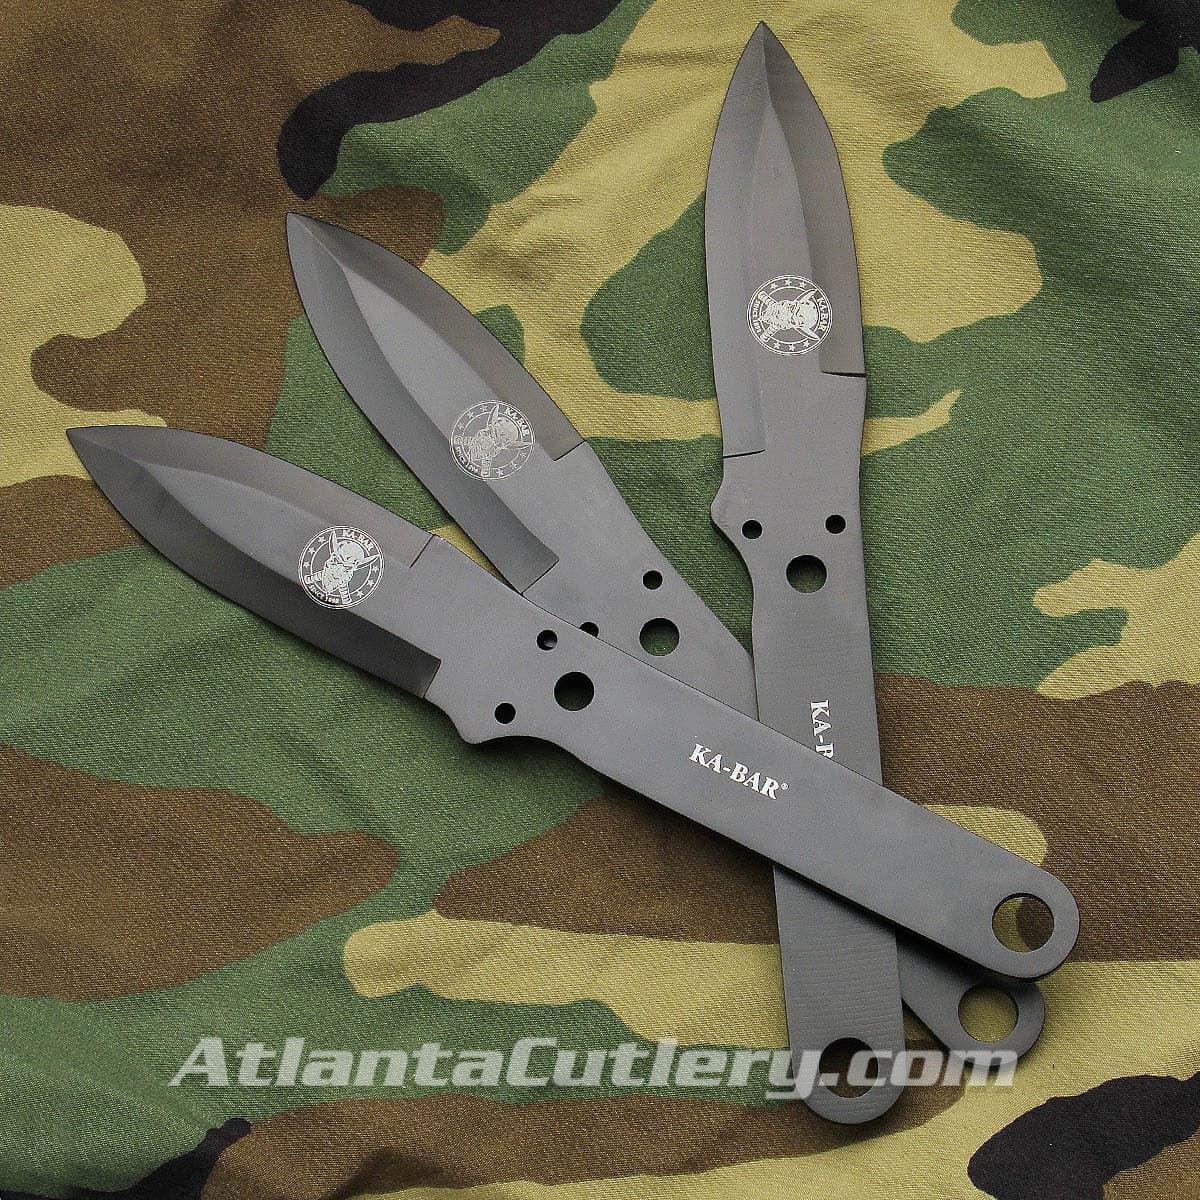 KA-BAR Set of 3 Throwing Knives